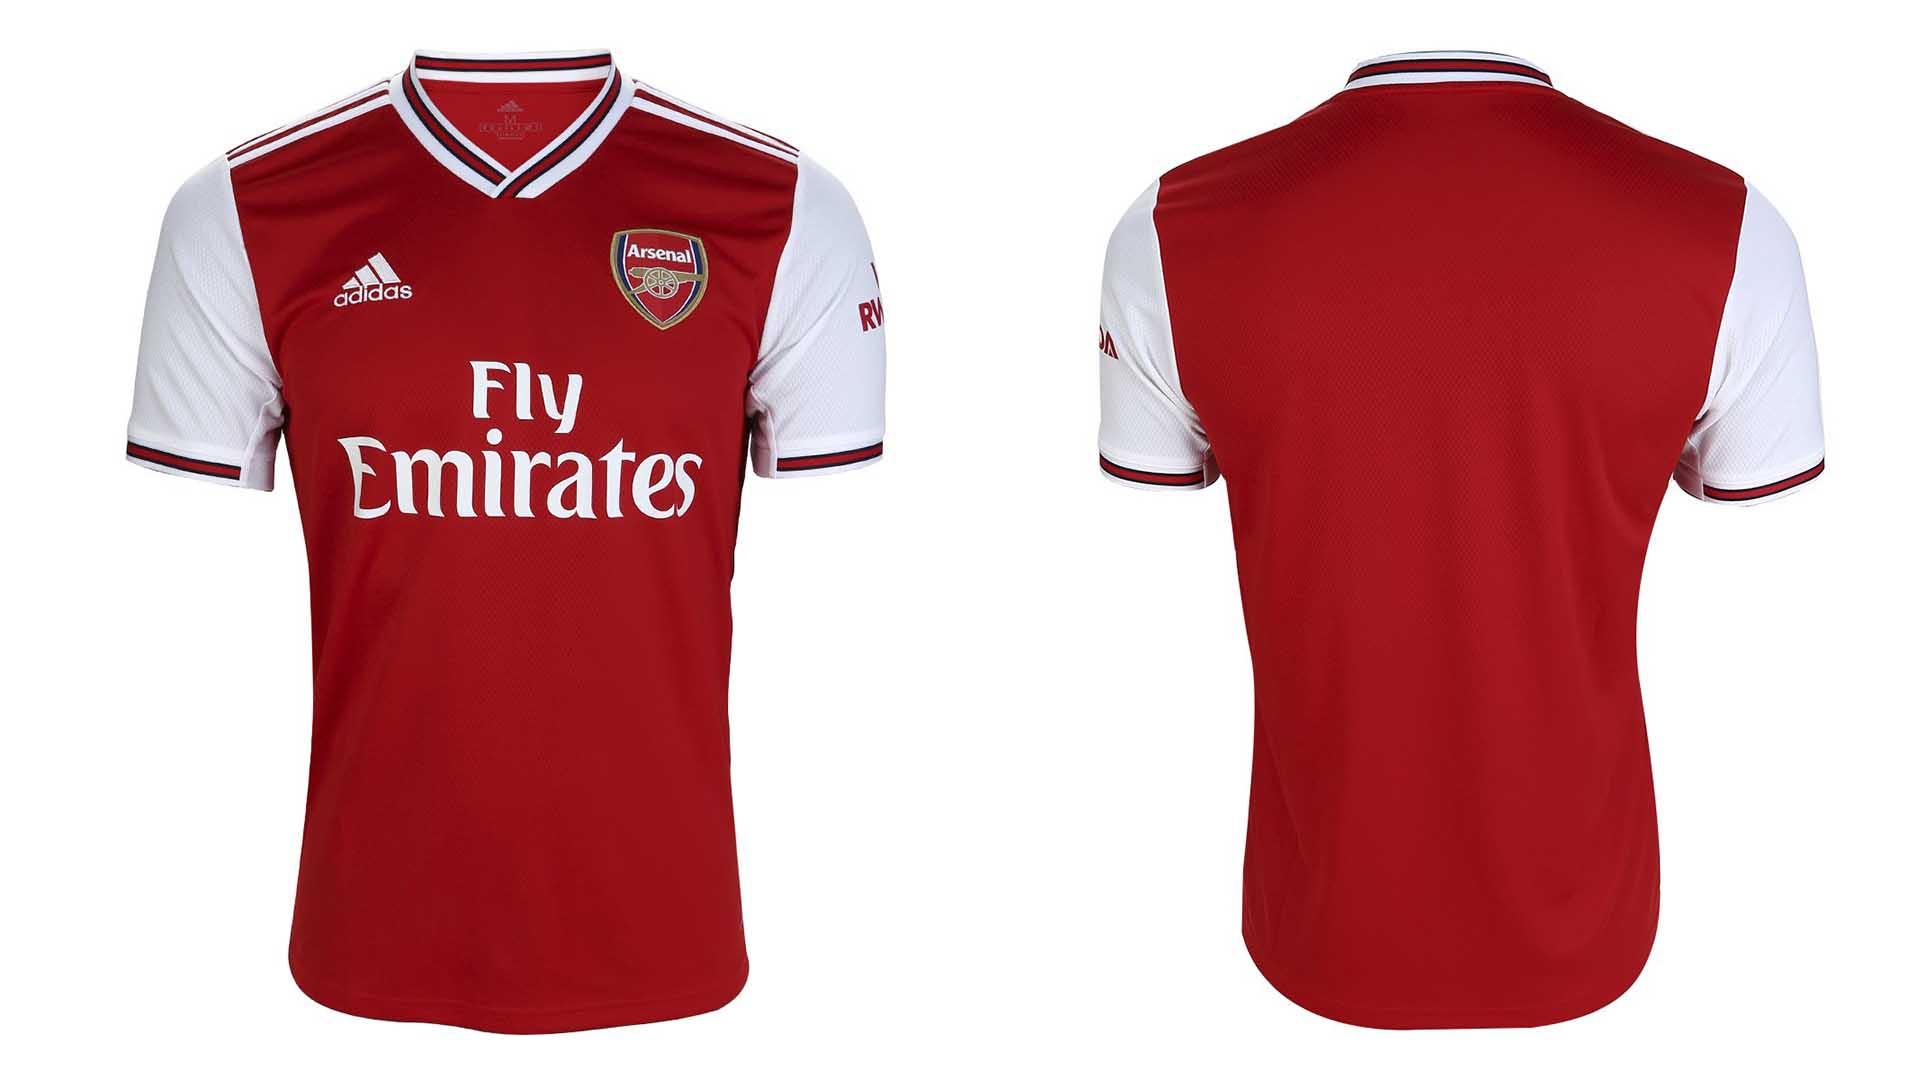 uniforme titular arsenal 2019 20